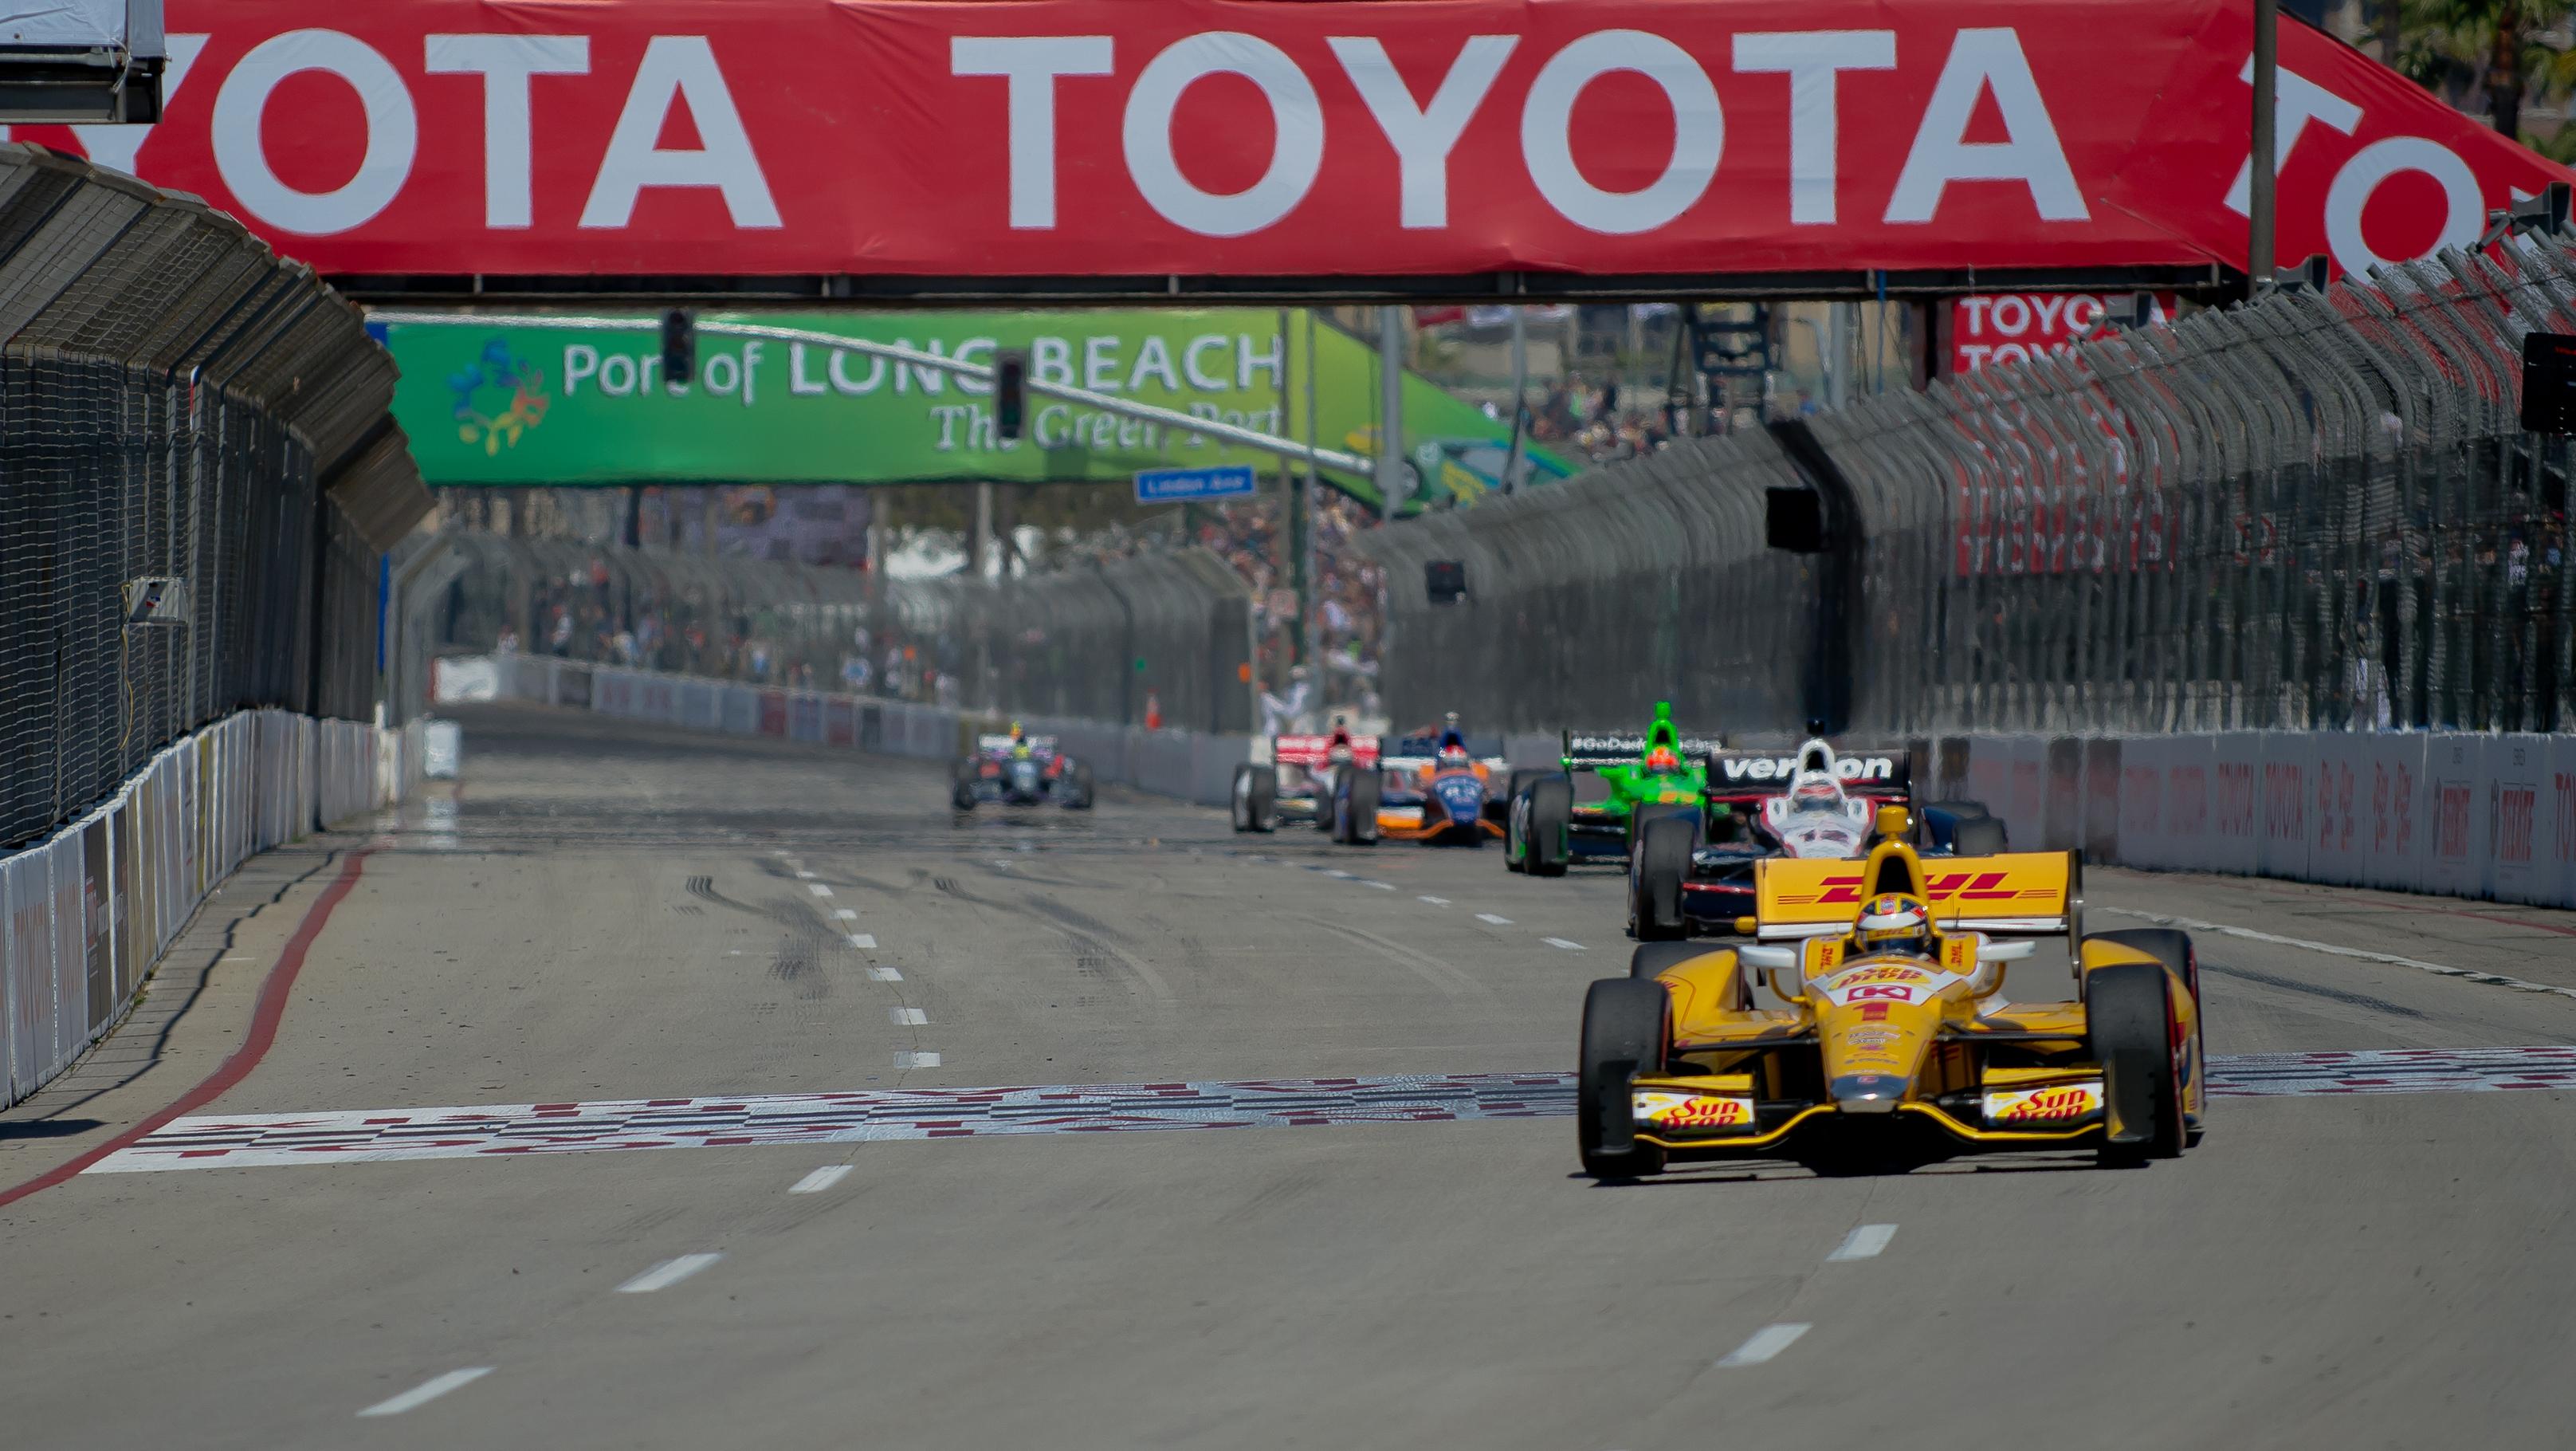 Long Beach Grand Prix Hans device